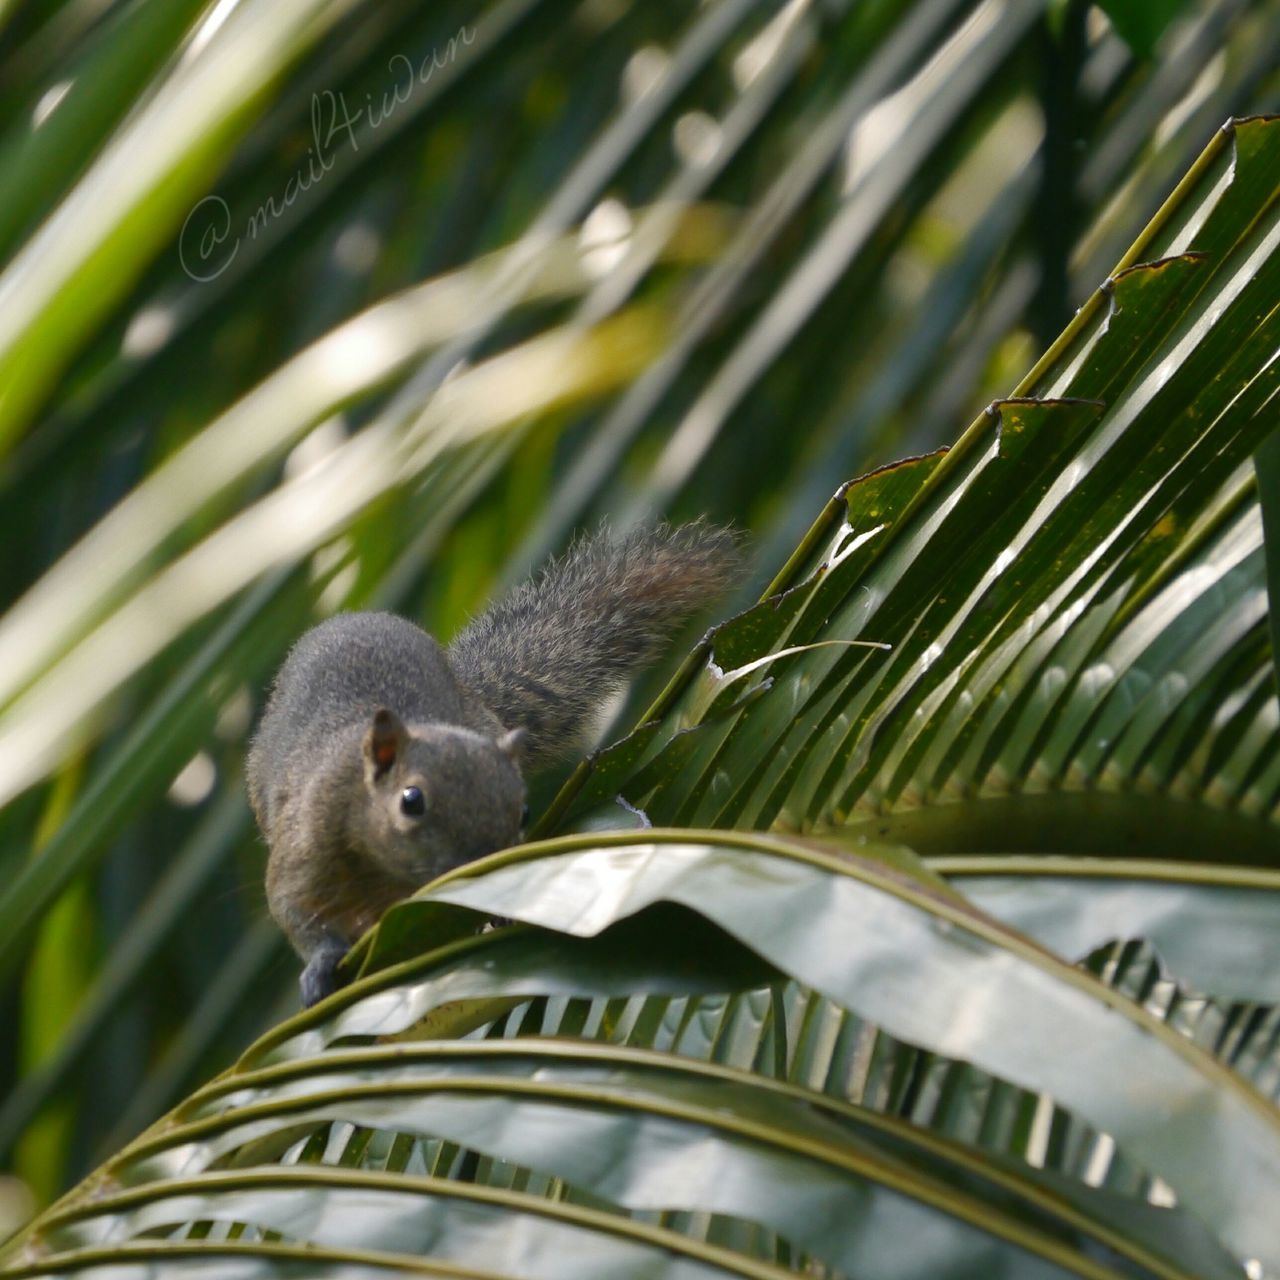 Animal Wildlife Animal One Animal Animals In The Wild Close-up Nature Tree Outdoors No People Palm Tree Day Bird Animal Themes